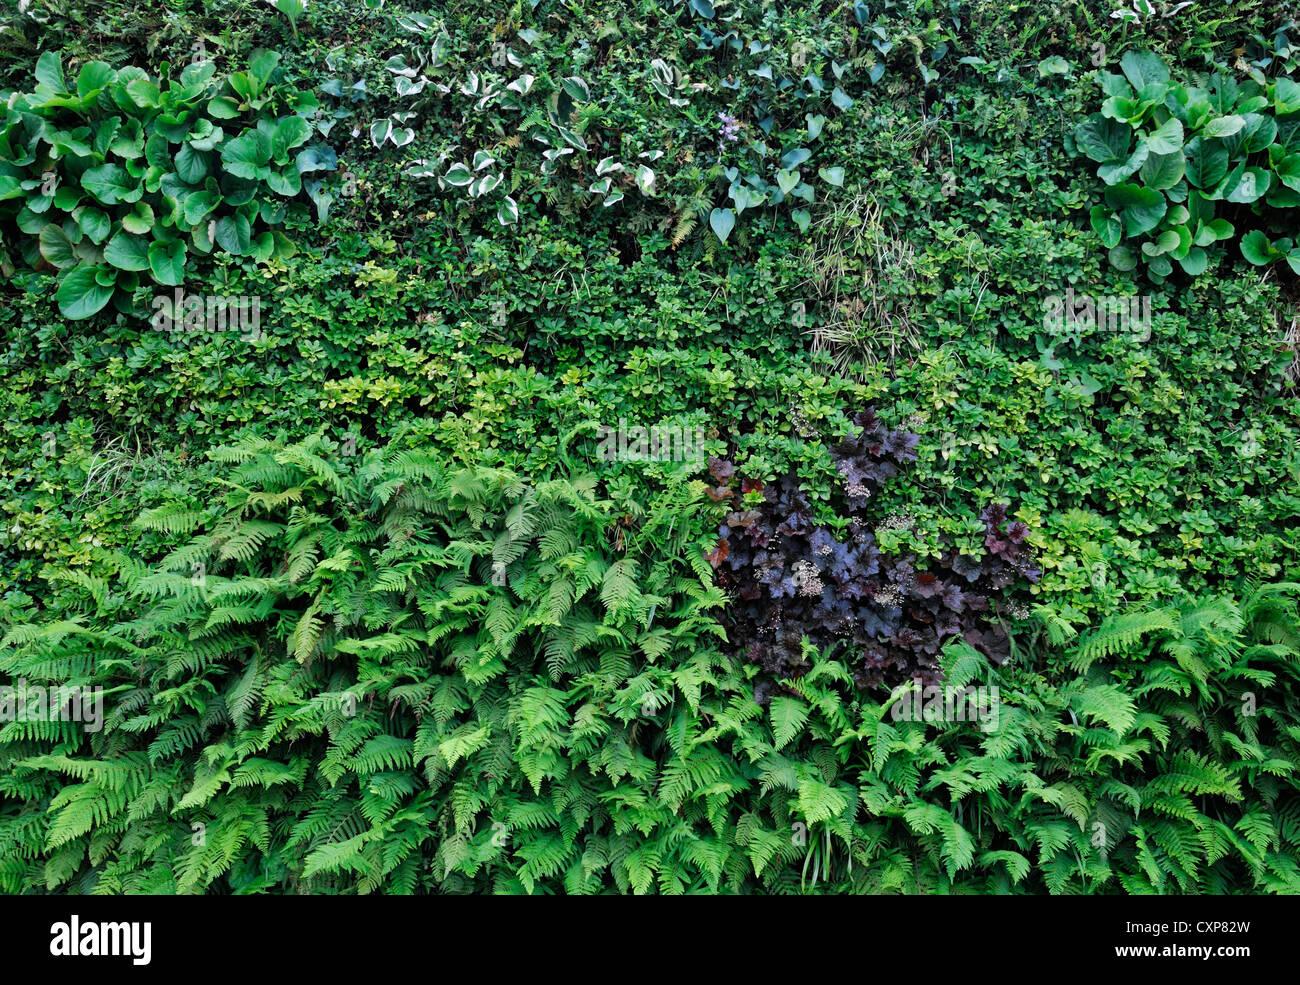 Living Green Wall Vertical Garden Gardening Urban Small Space Pachysandra  Terminalis Heuchera Hosta Bergenia Liriope